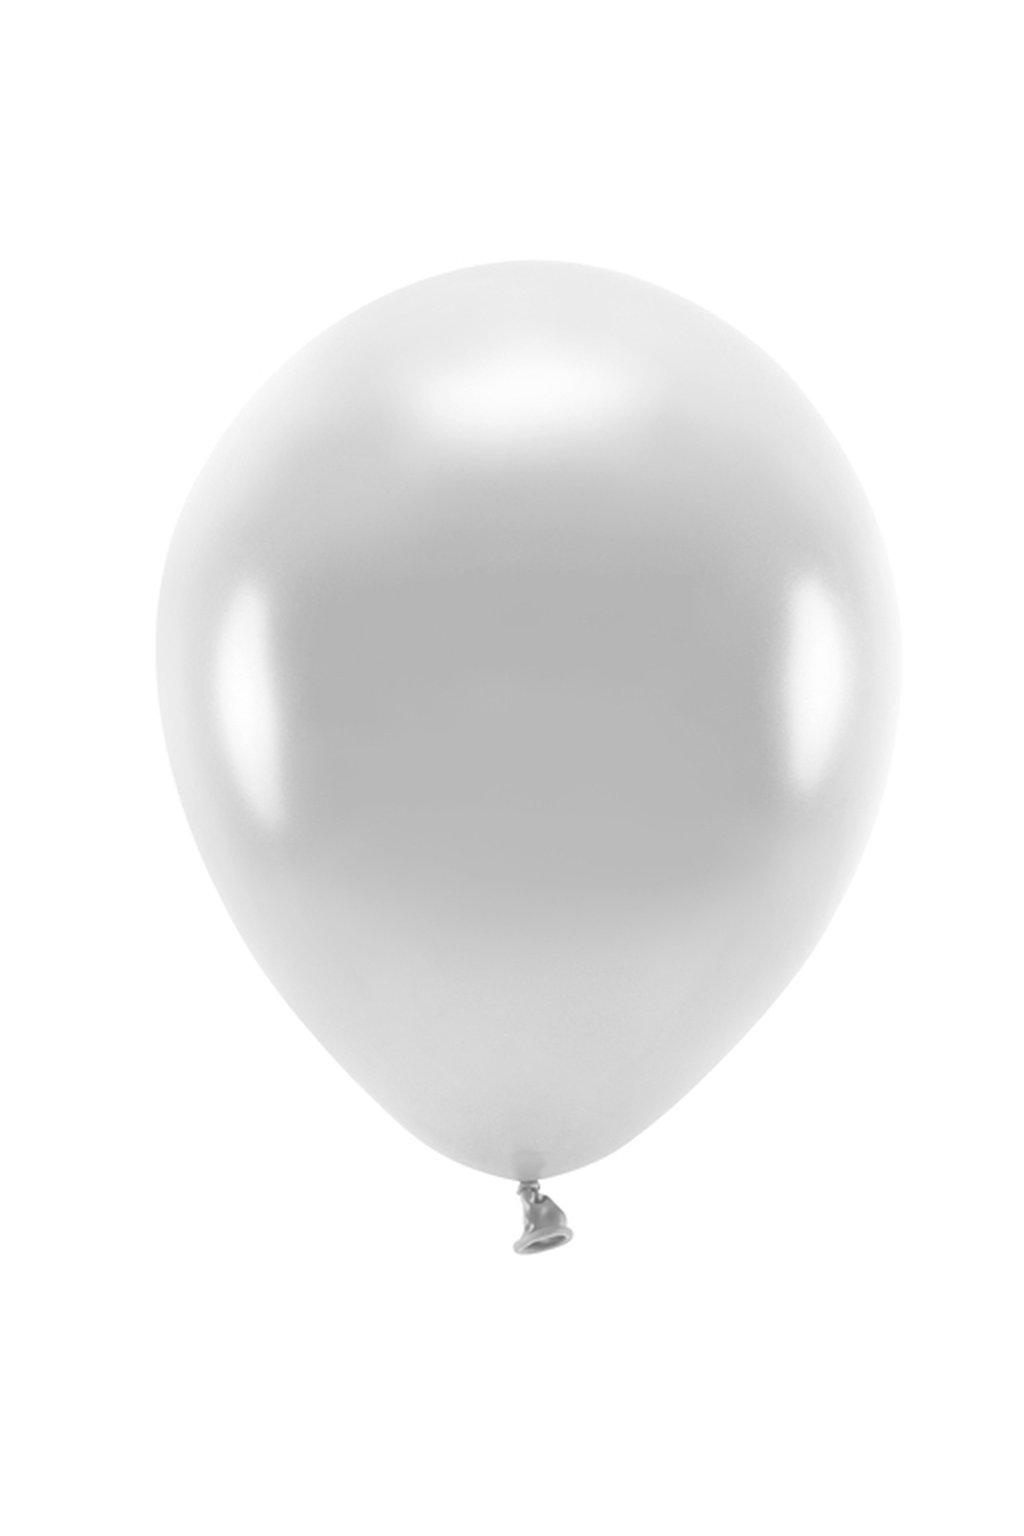 Nafukovací balónek stříbrný - 27 cm